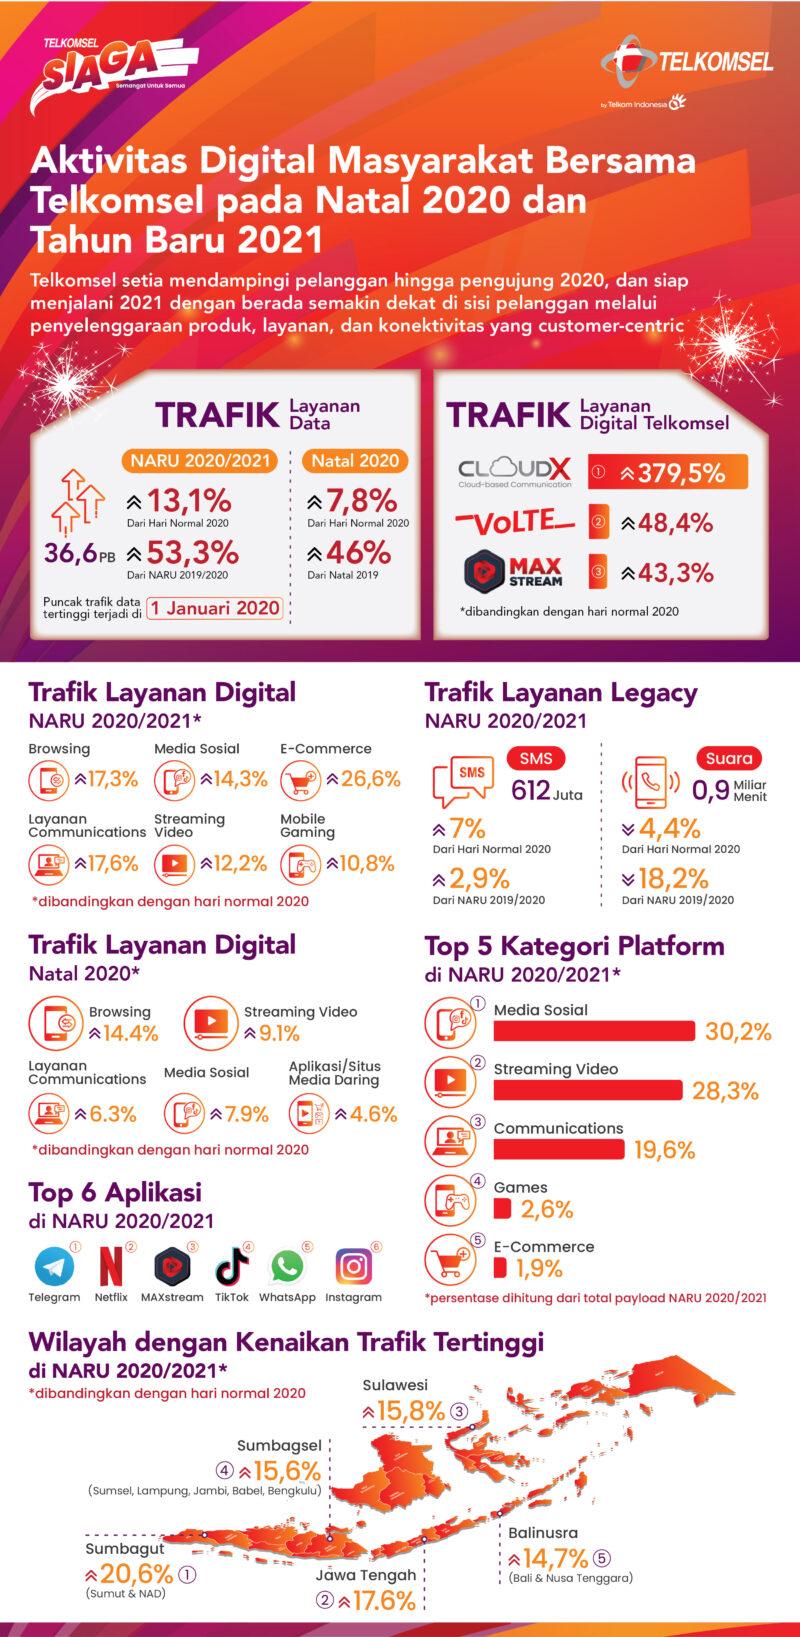 Trafik Layanan Data Telkomsel